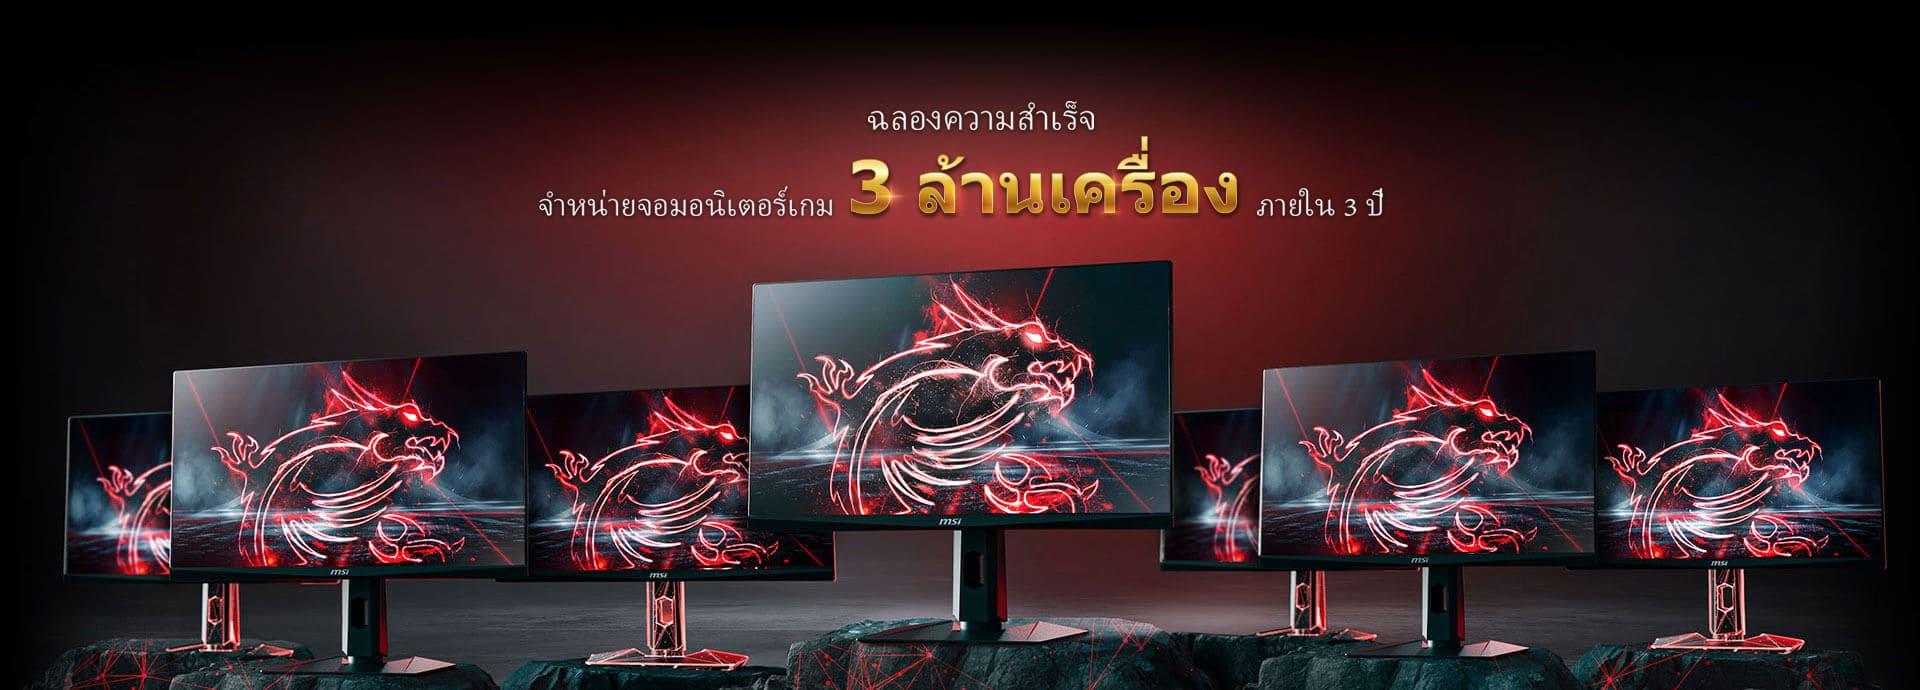 3M Monitor